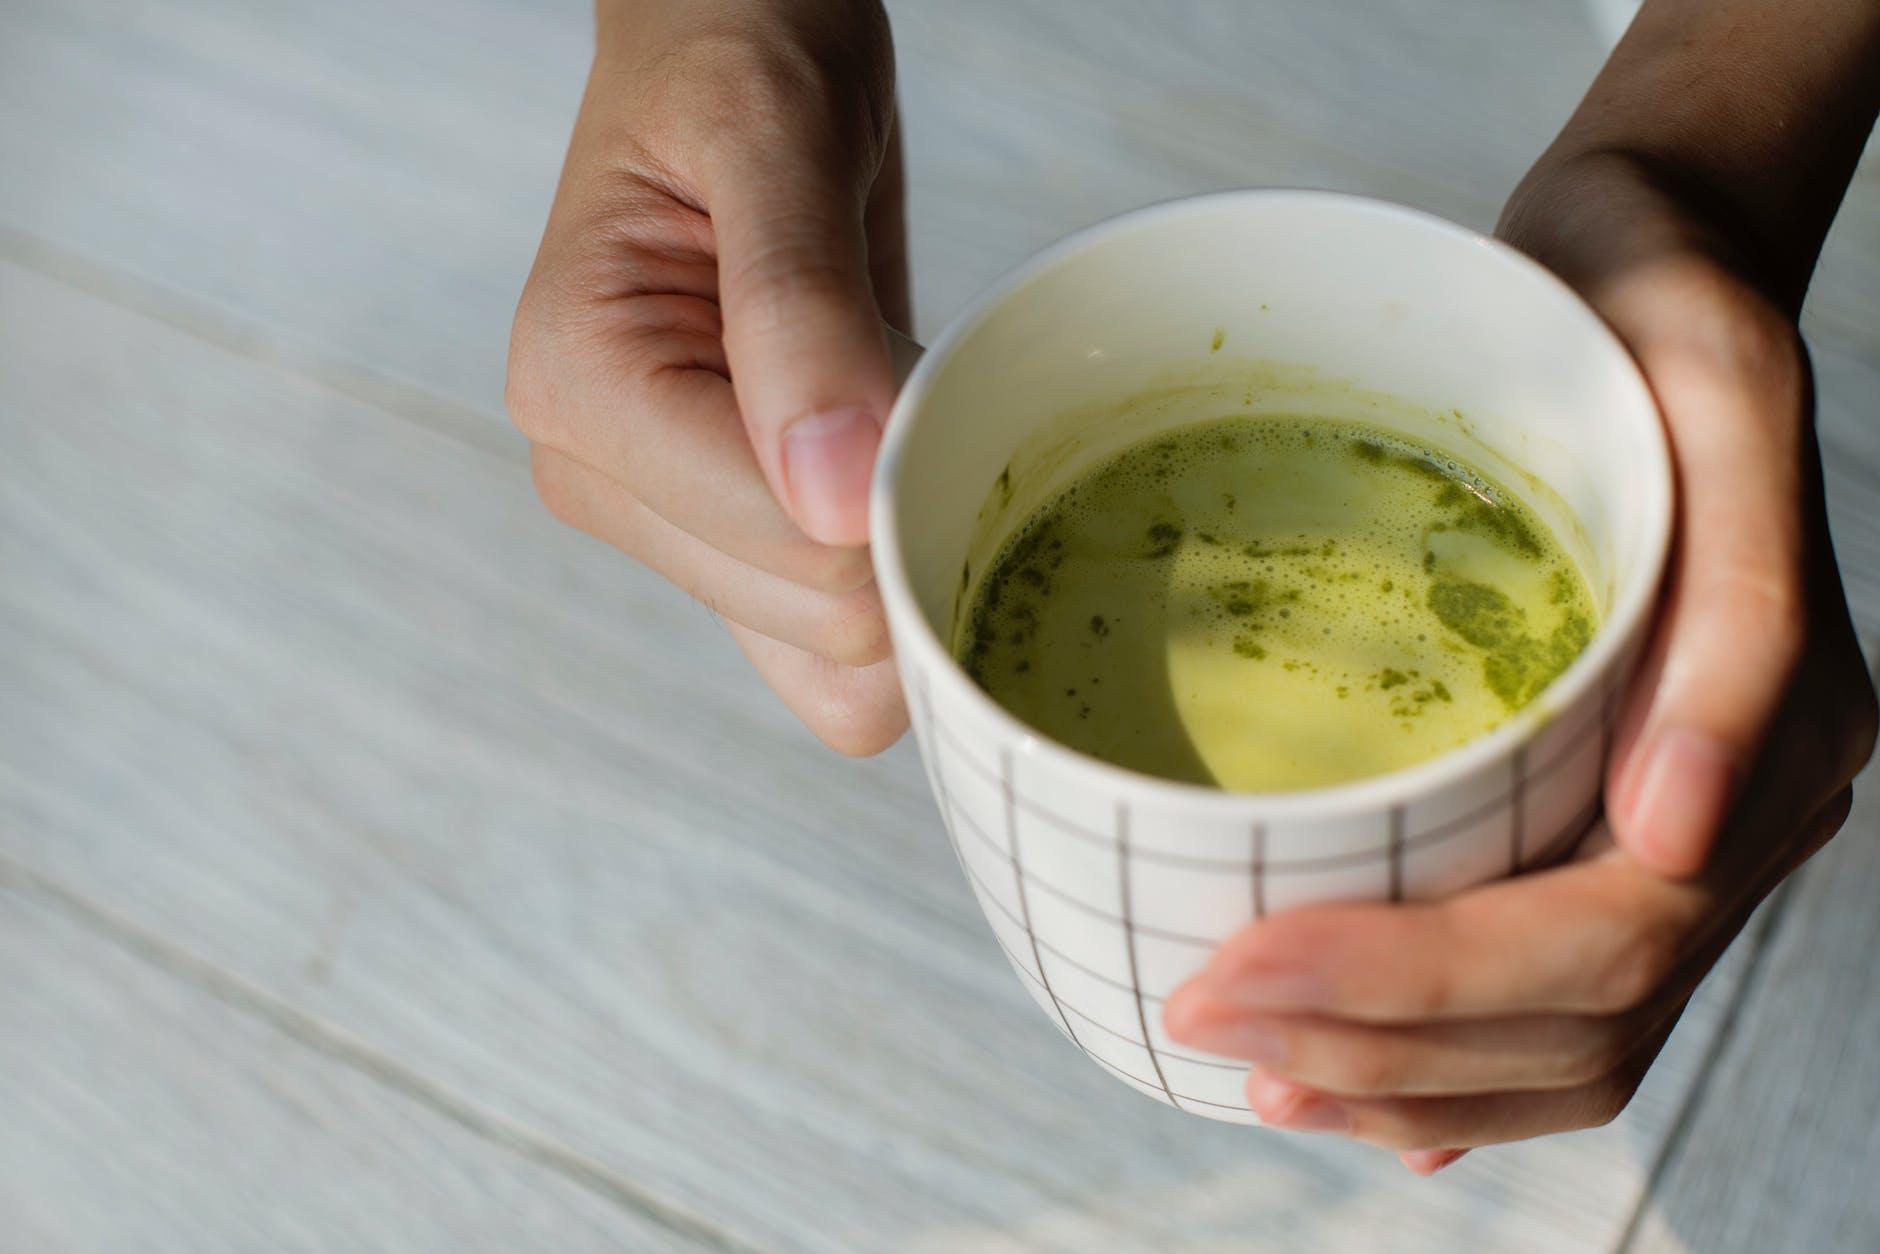 Take a green coffee | LuckyFit